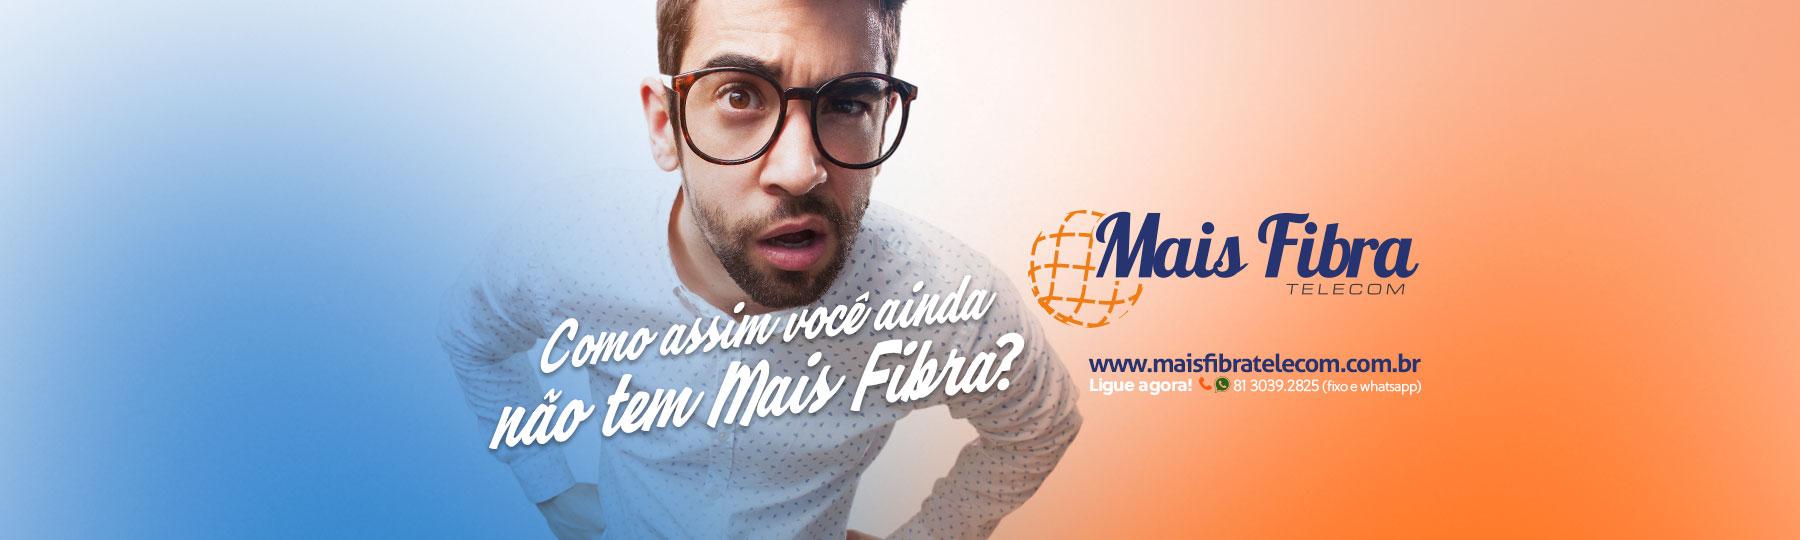 MAIS_FIBRA_BANNER_GIRATORIO_SITE_04